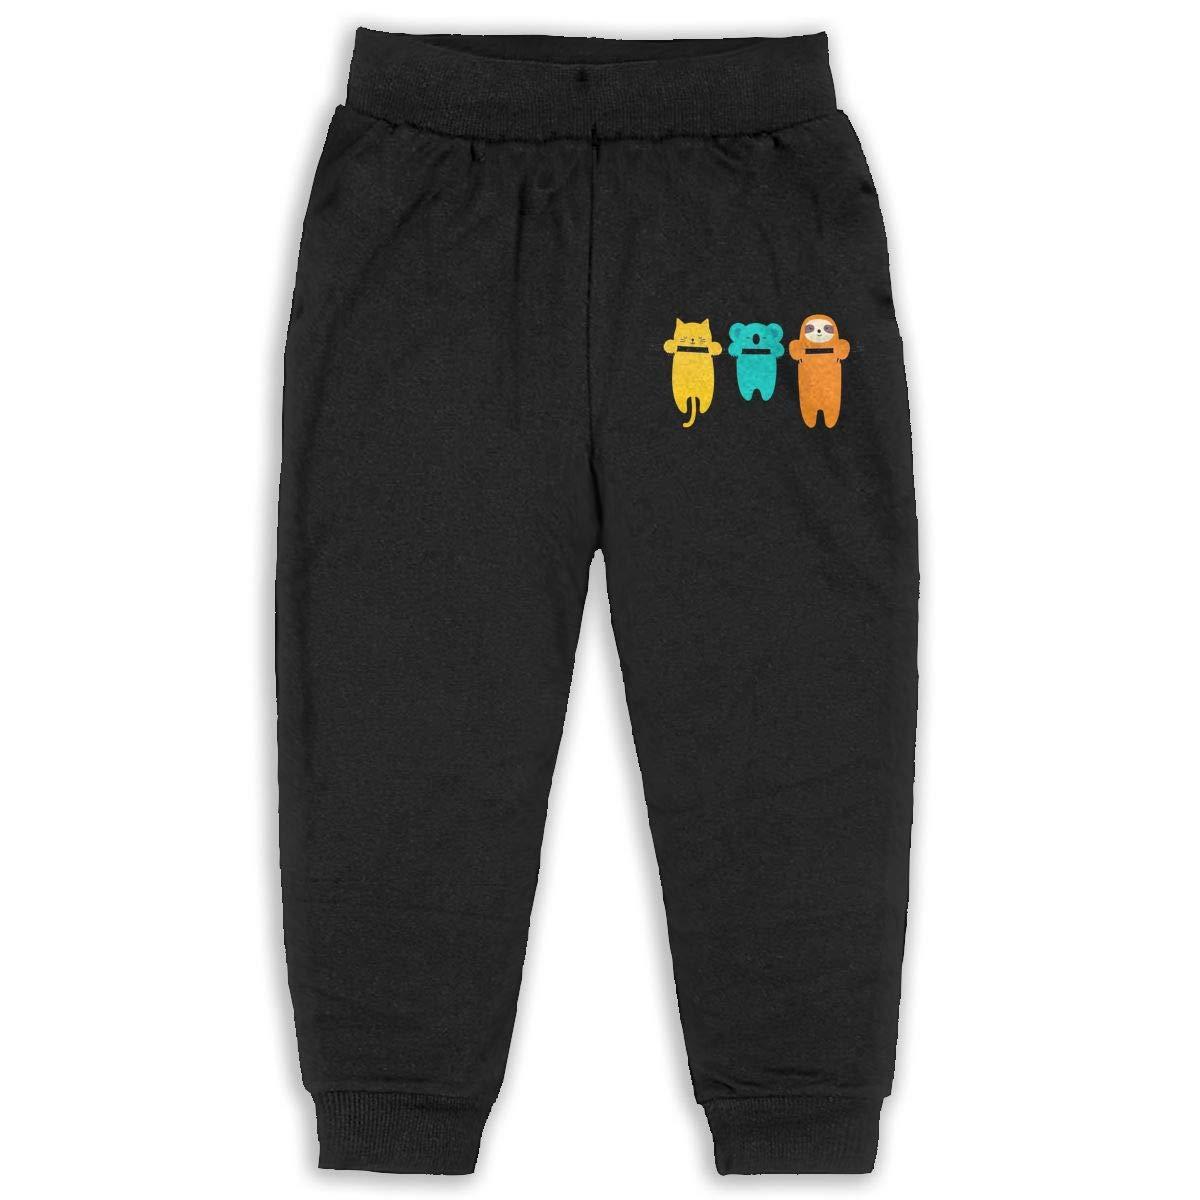 Koala,Sloth Unisex 2-6T Autumn and Winter Cotton Fashion Pants Child